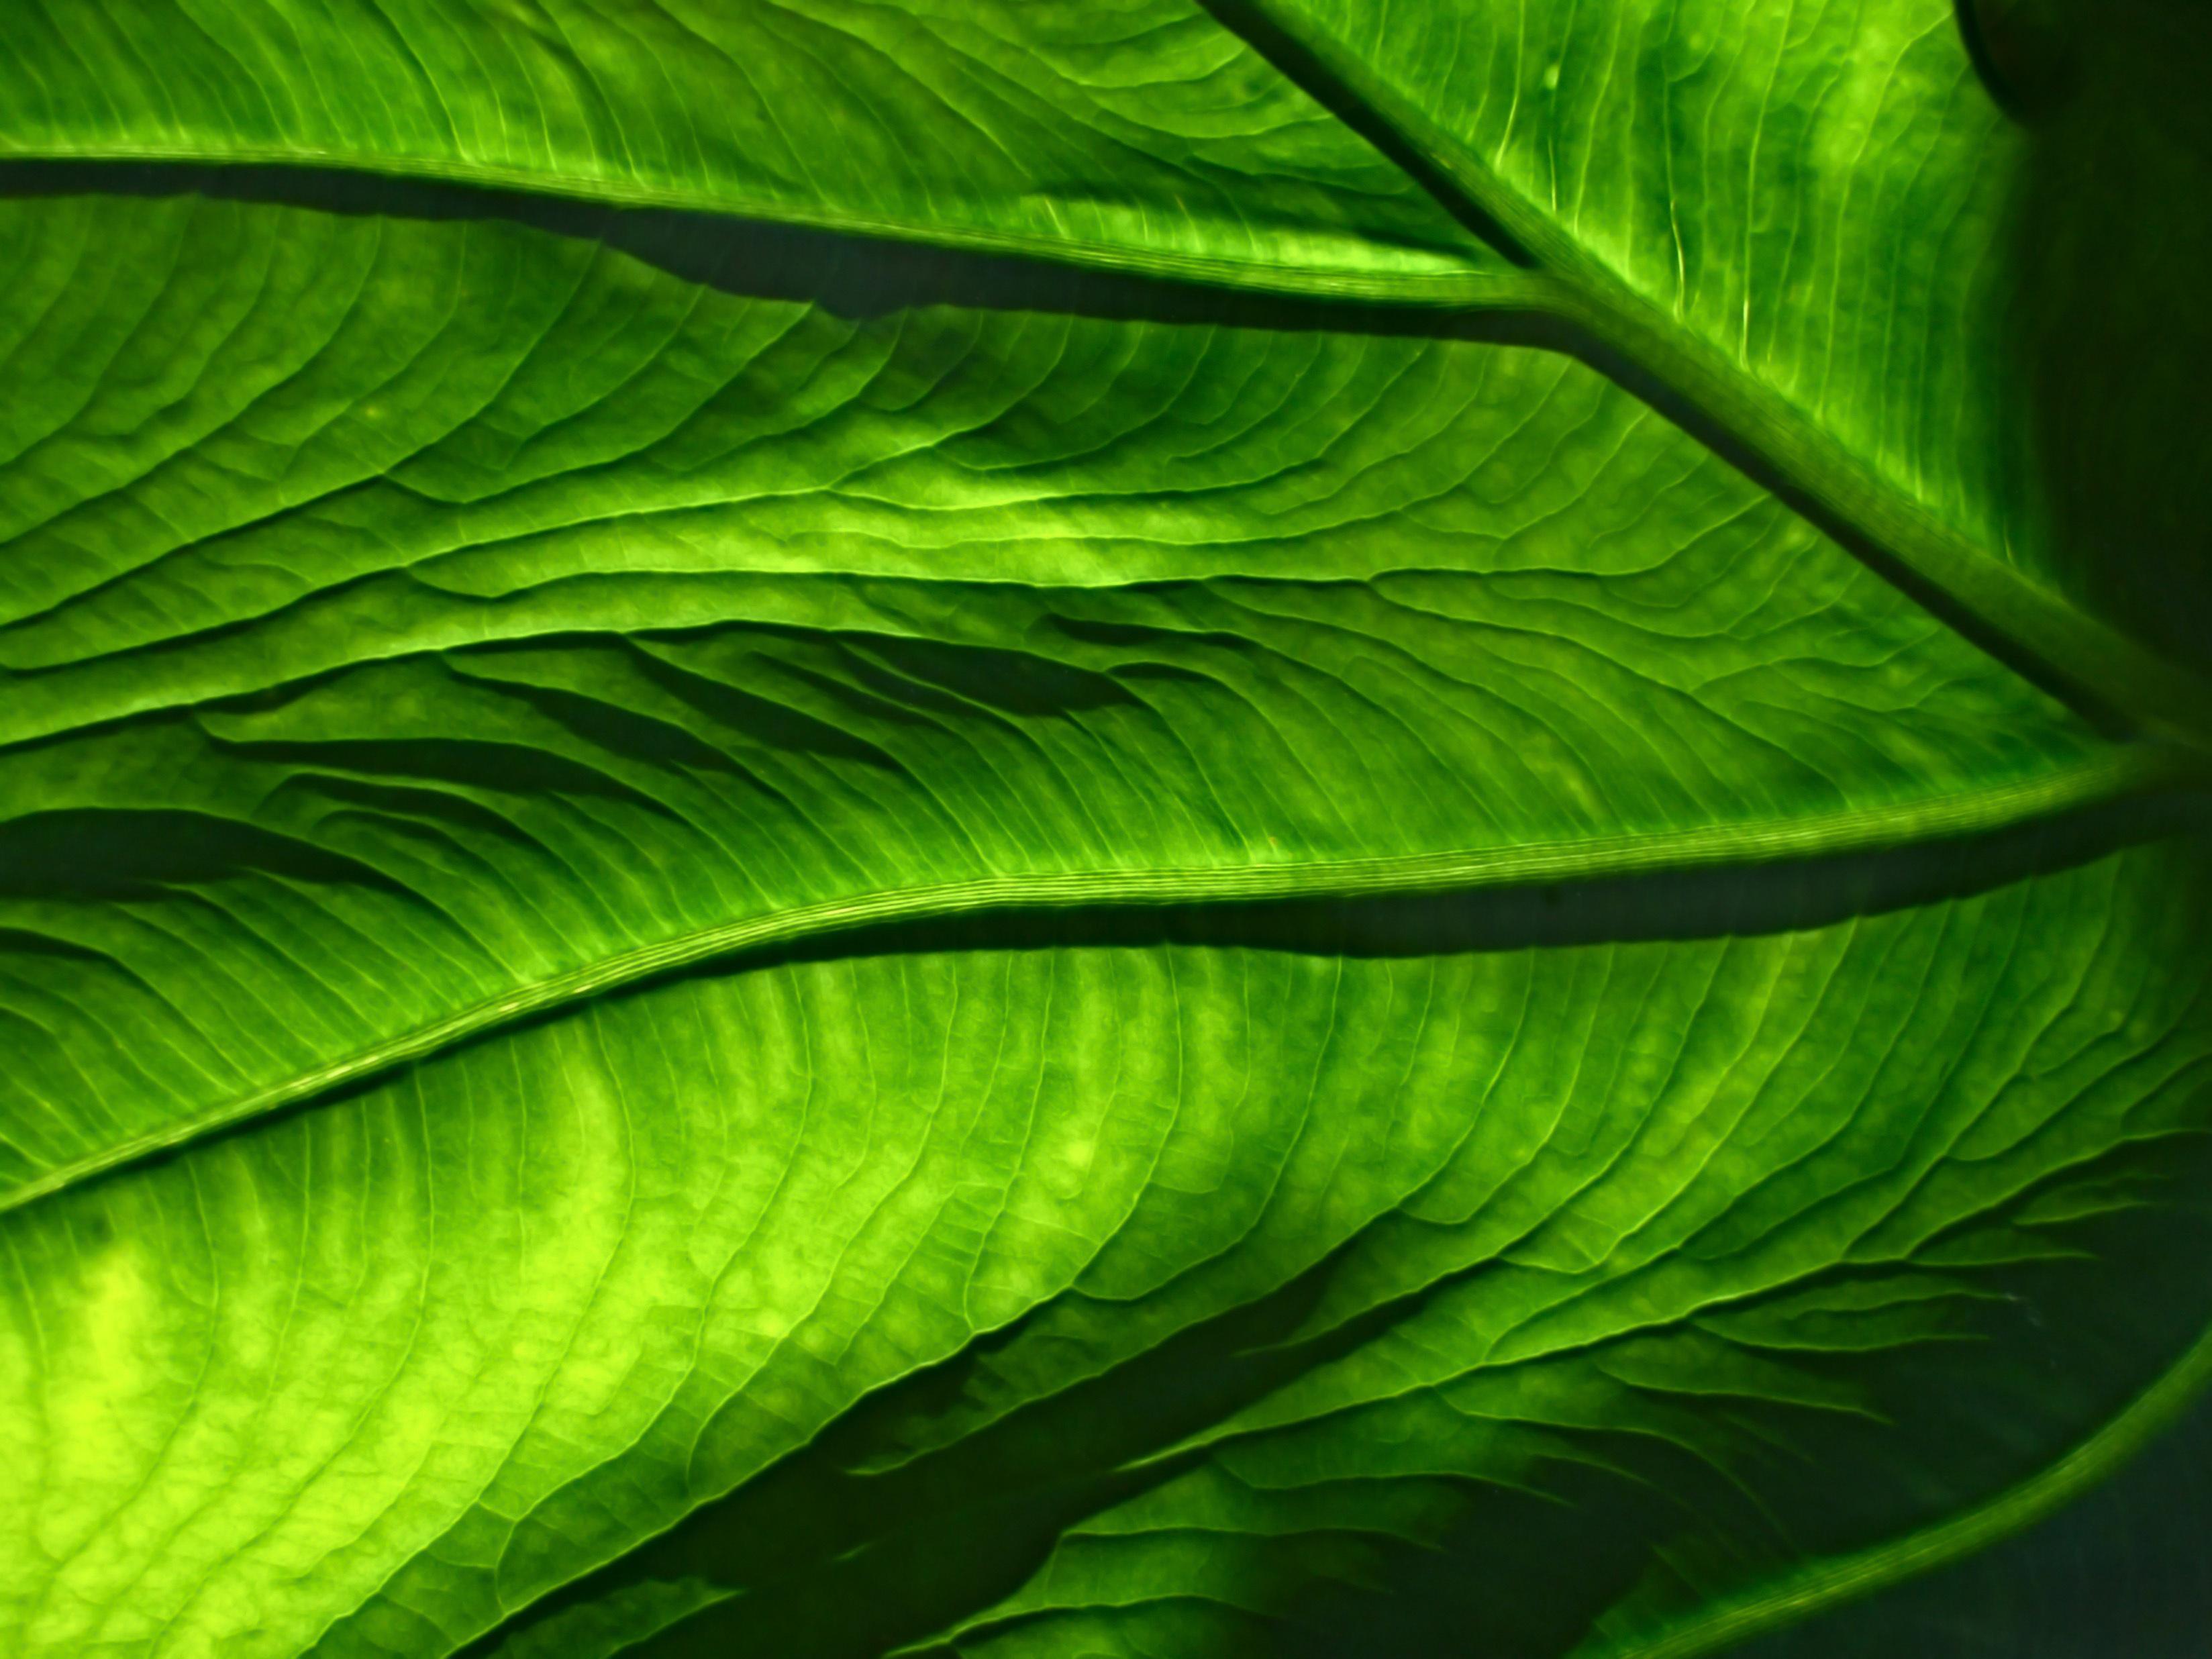 free photo green veins texture vein plant free download jooinn